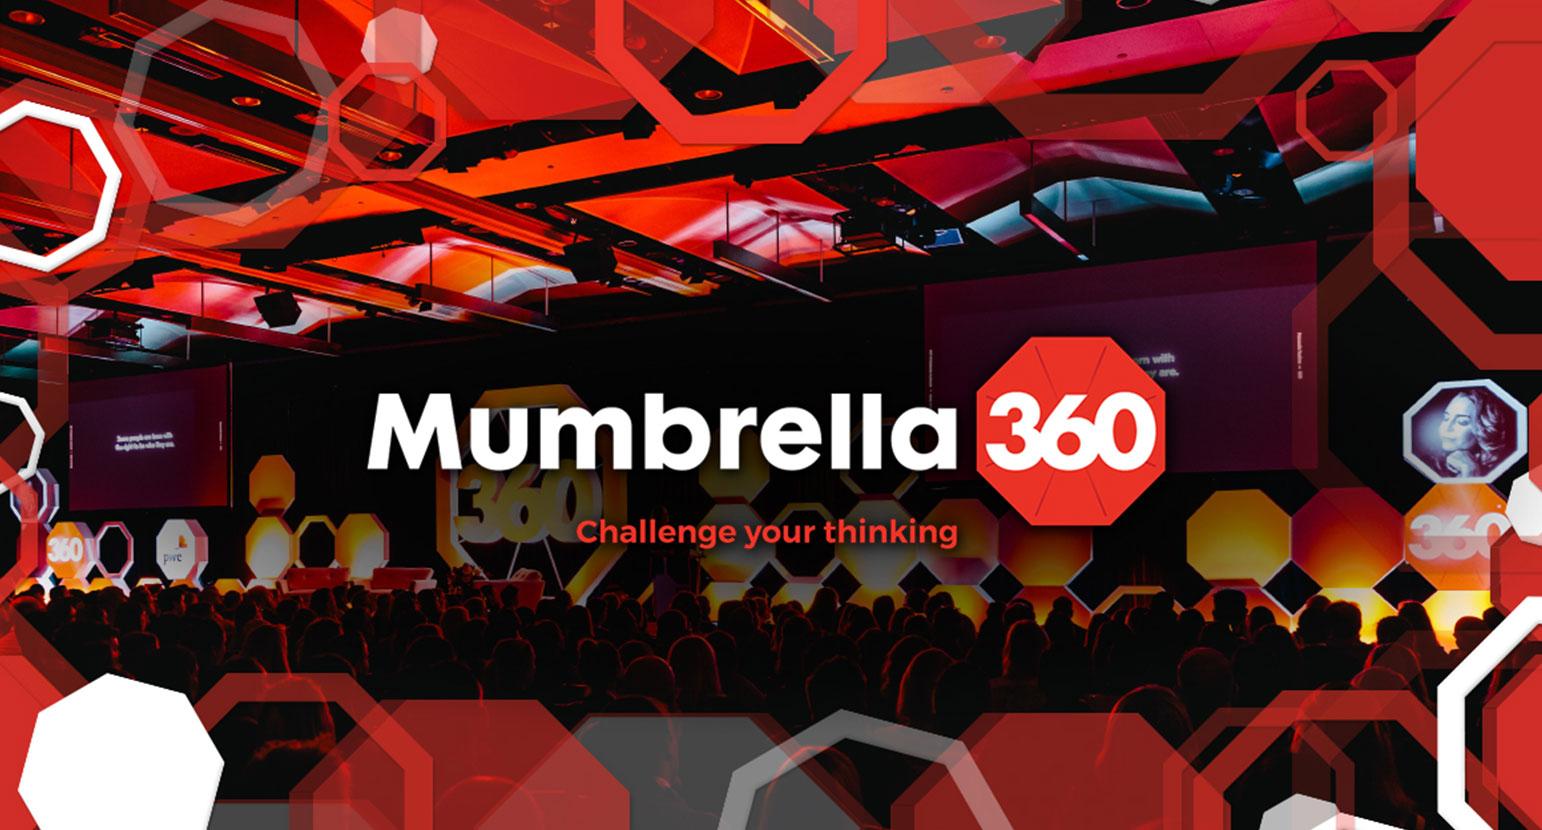 Mumbrella 360 Event- challenge your thinking